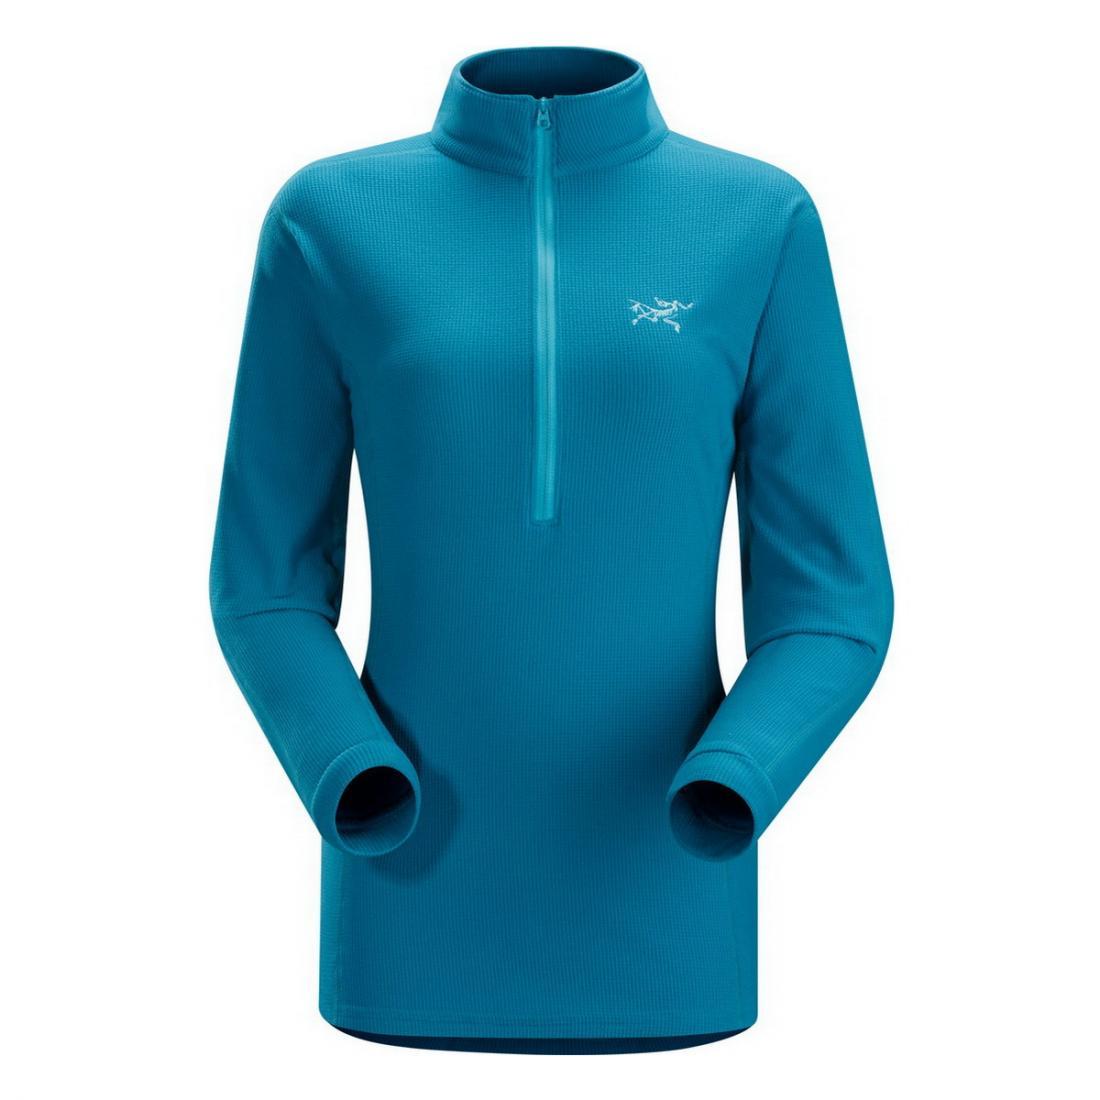 Куртка Delta LT Zip жен.Пуловеры<br><br><br>Цвет: Синий<br>Размер: L